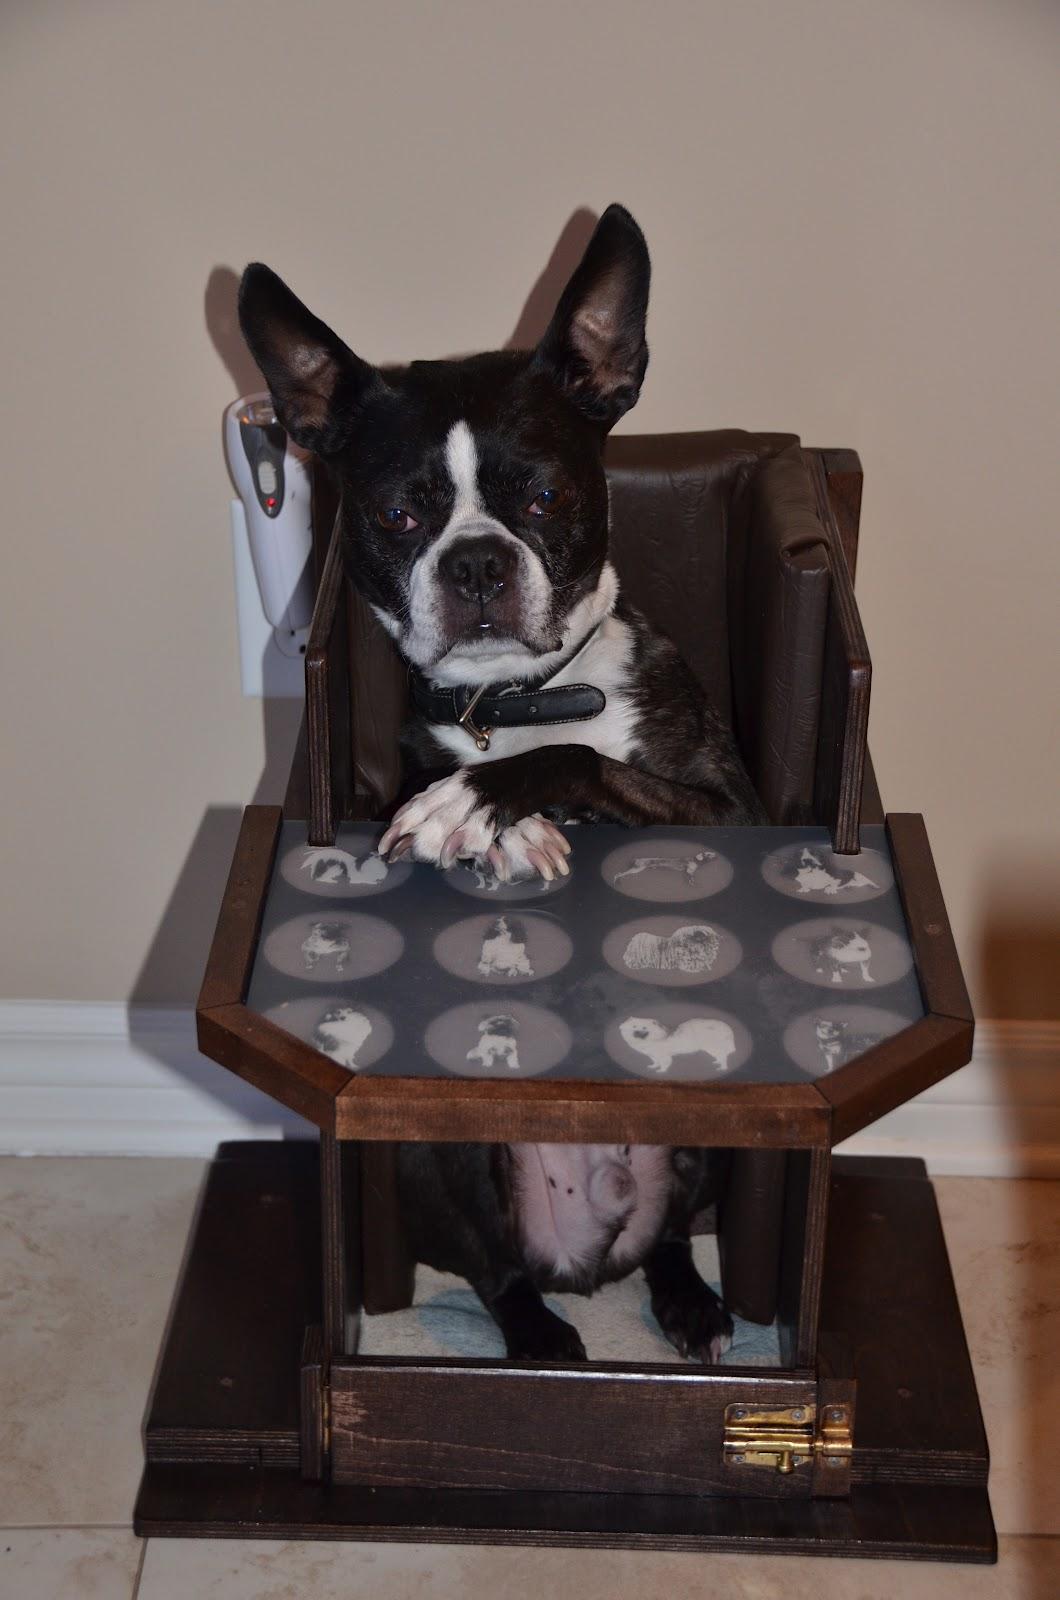 Boscoe-Diary of a dog with Megaesophagus